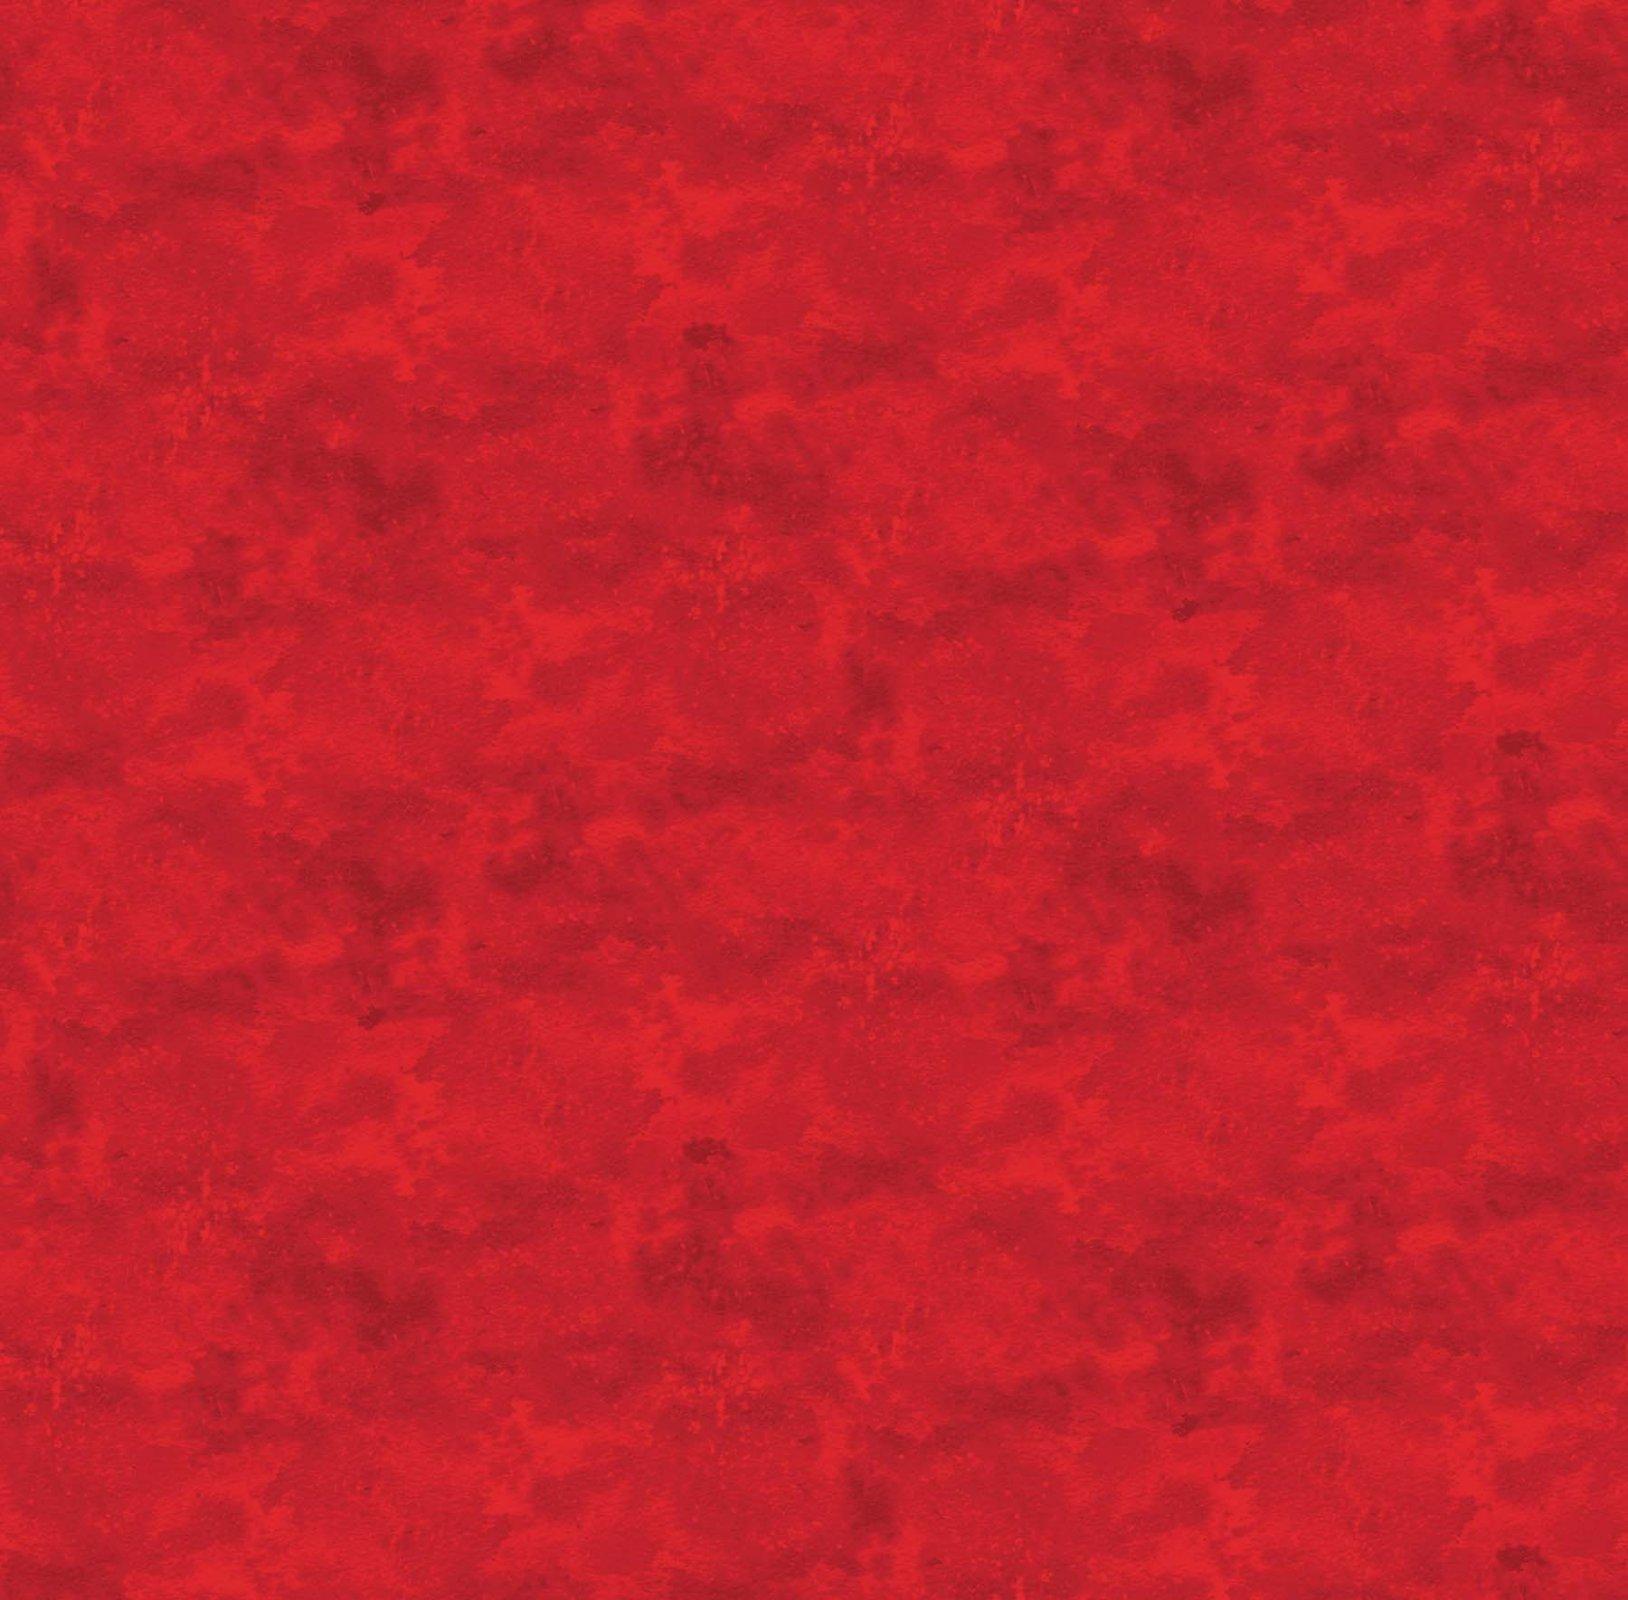 Northcott Toscana Cardinal - #9020-24